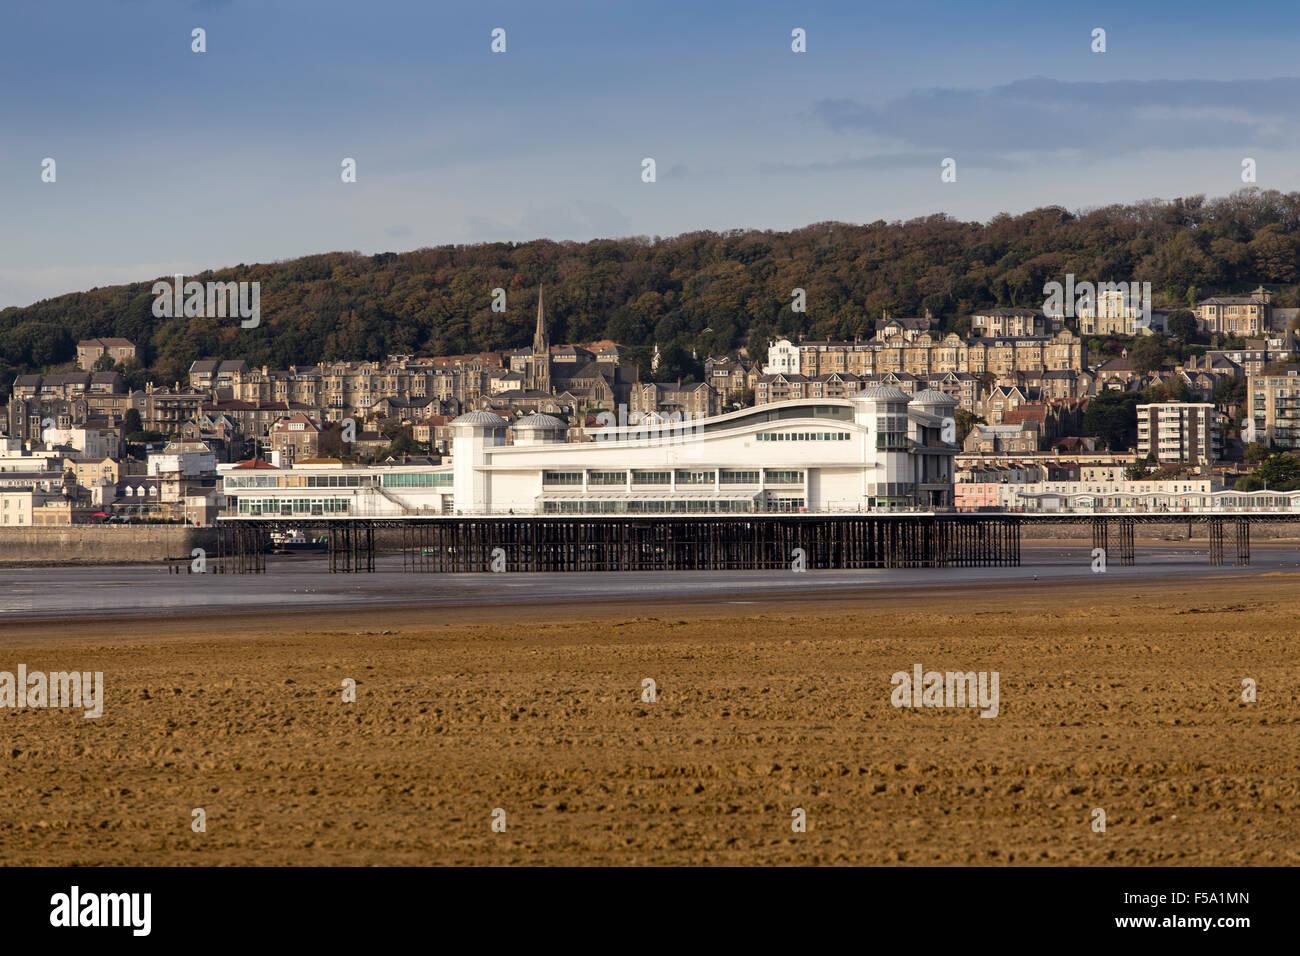 Weston Super Mare New Rebuilt Grand Pier Somerset England UK - Stock Image